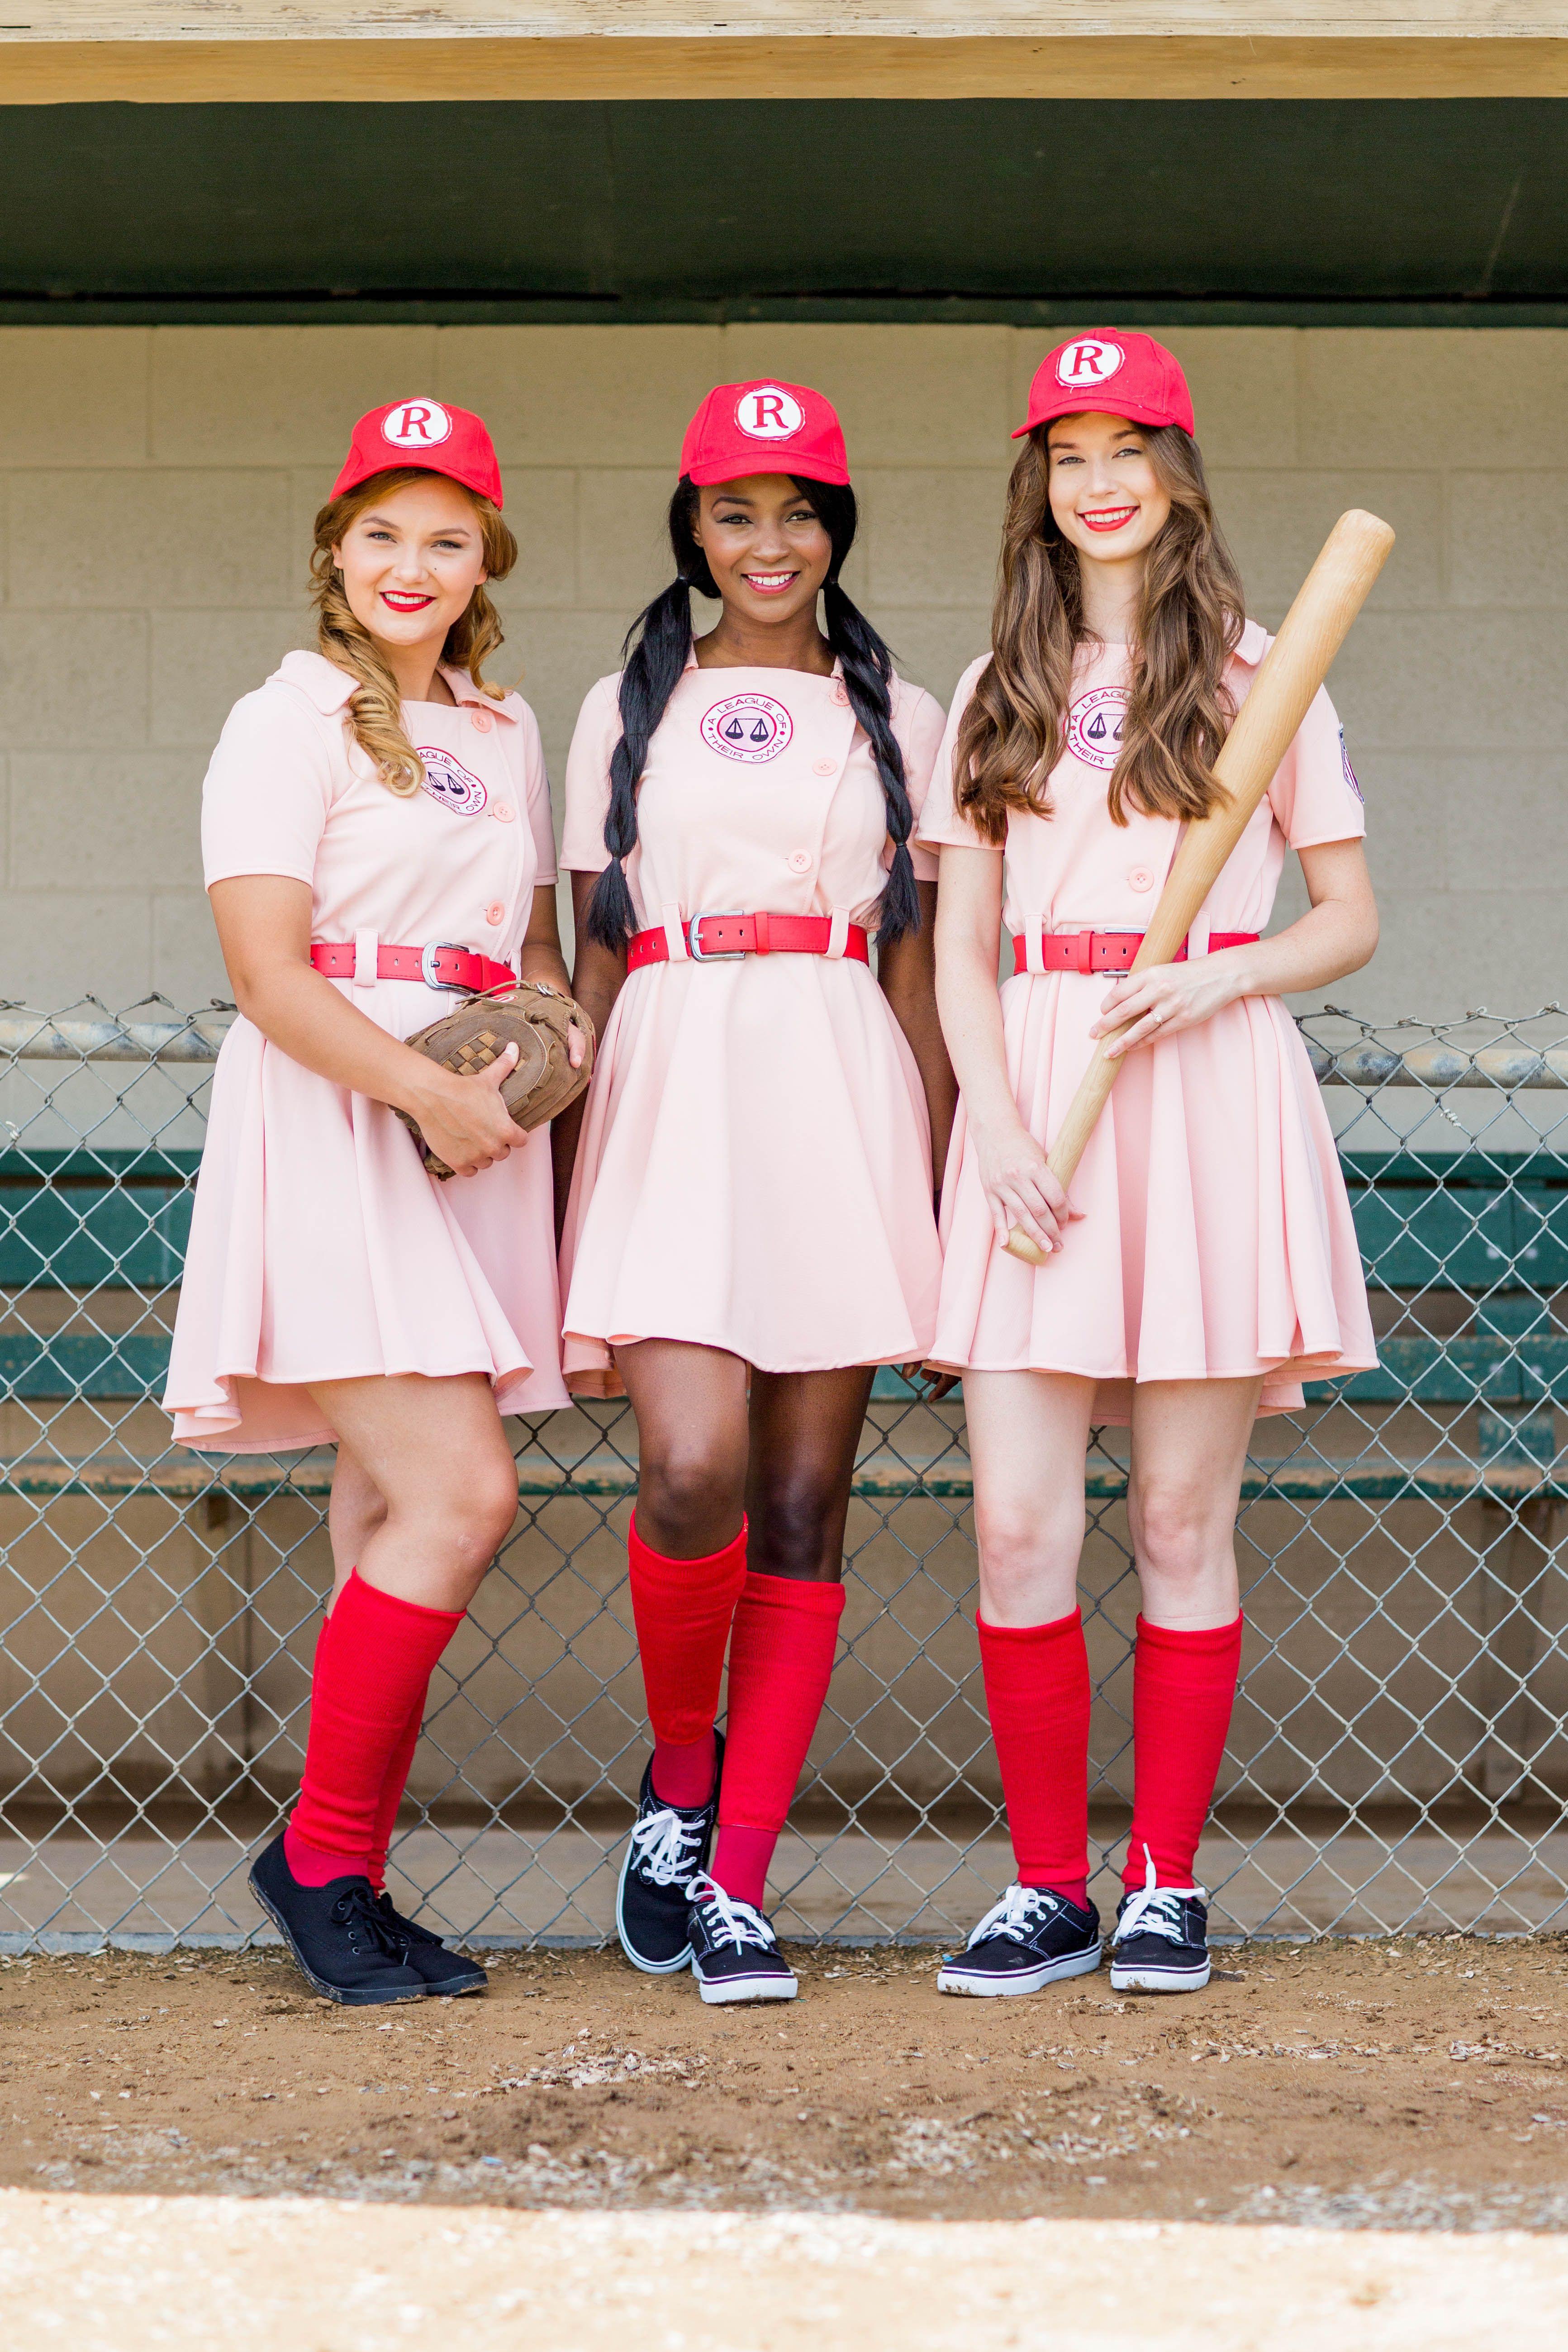 Fun Groupindividual Halloween Costume Idea- Hit The Bases -9345